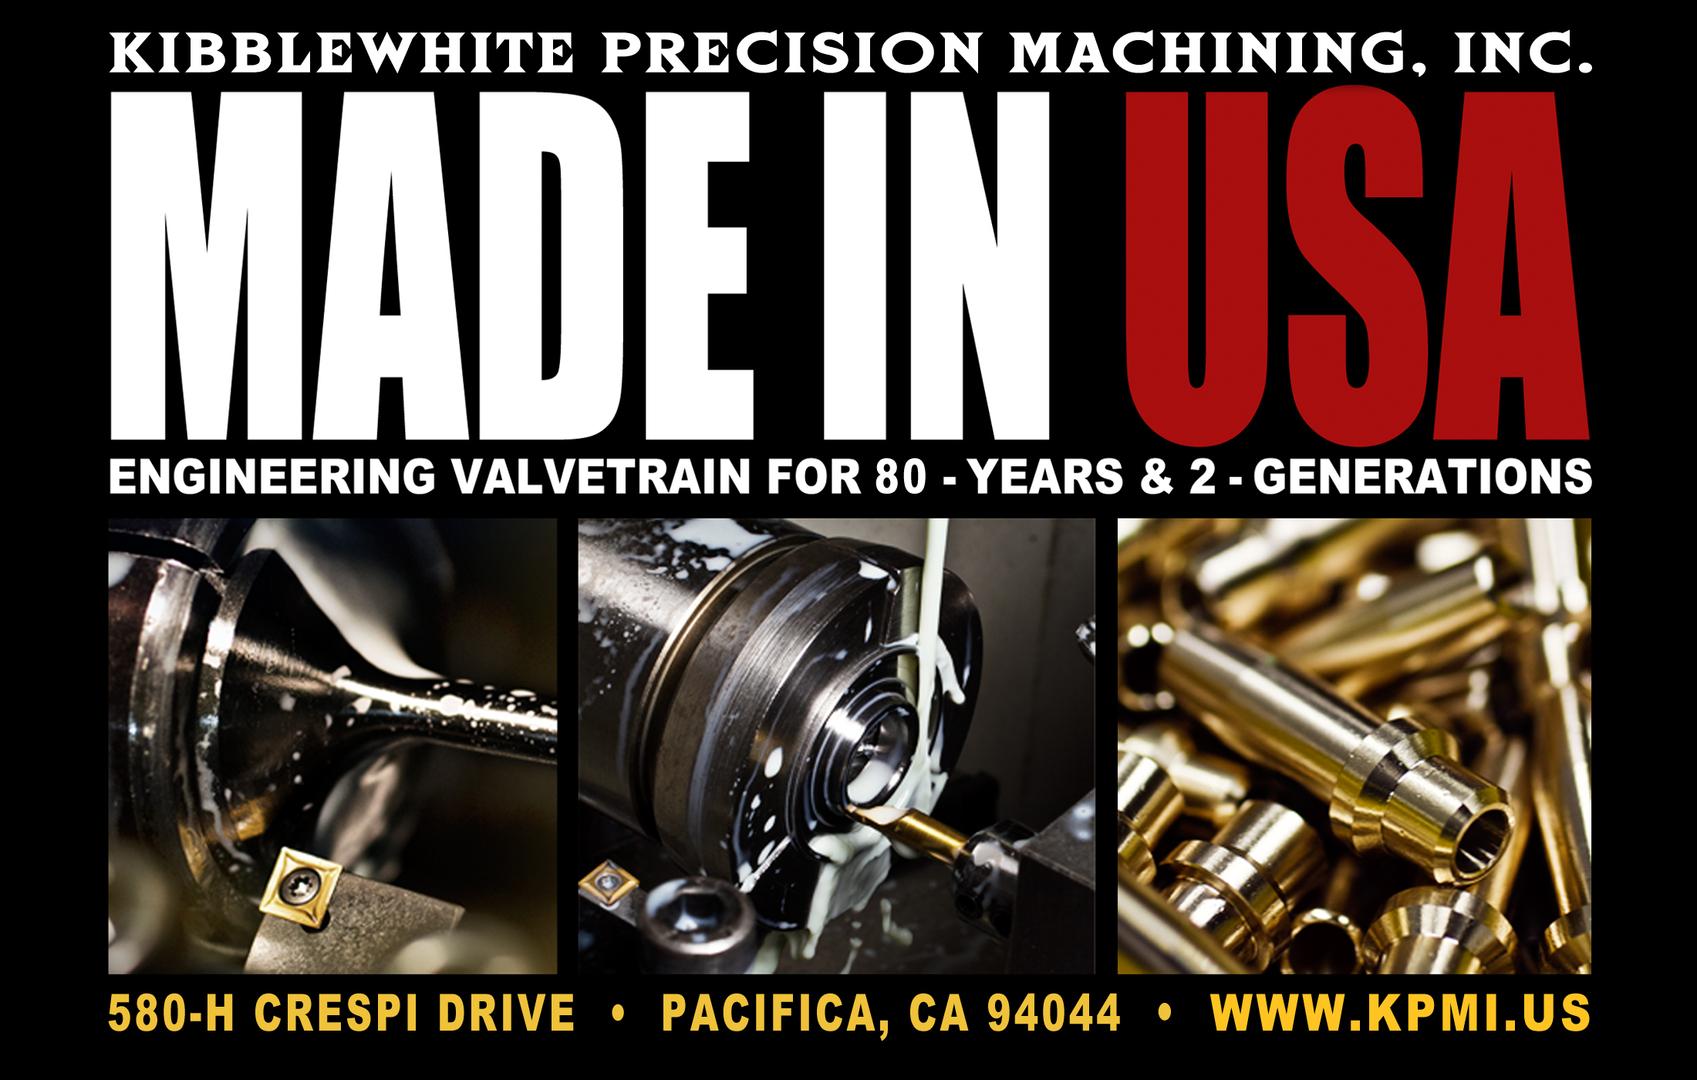 Kibblewhite Precision Machining, inc - Motorcycle Valvetrain